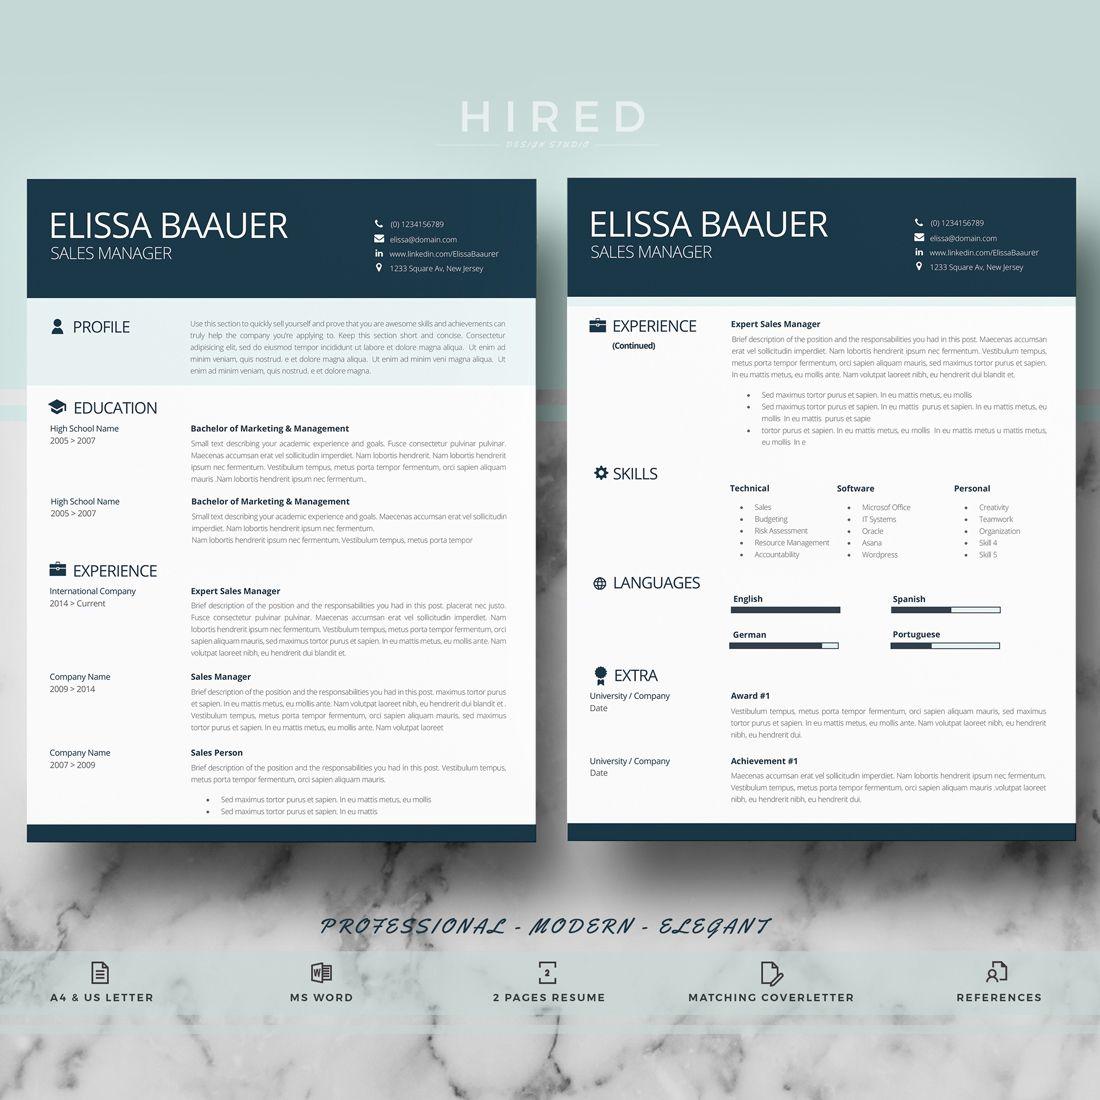 Pin de Hired Design Studio en Resume Templates for MS Word | Pinterest